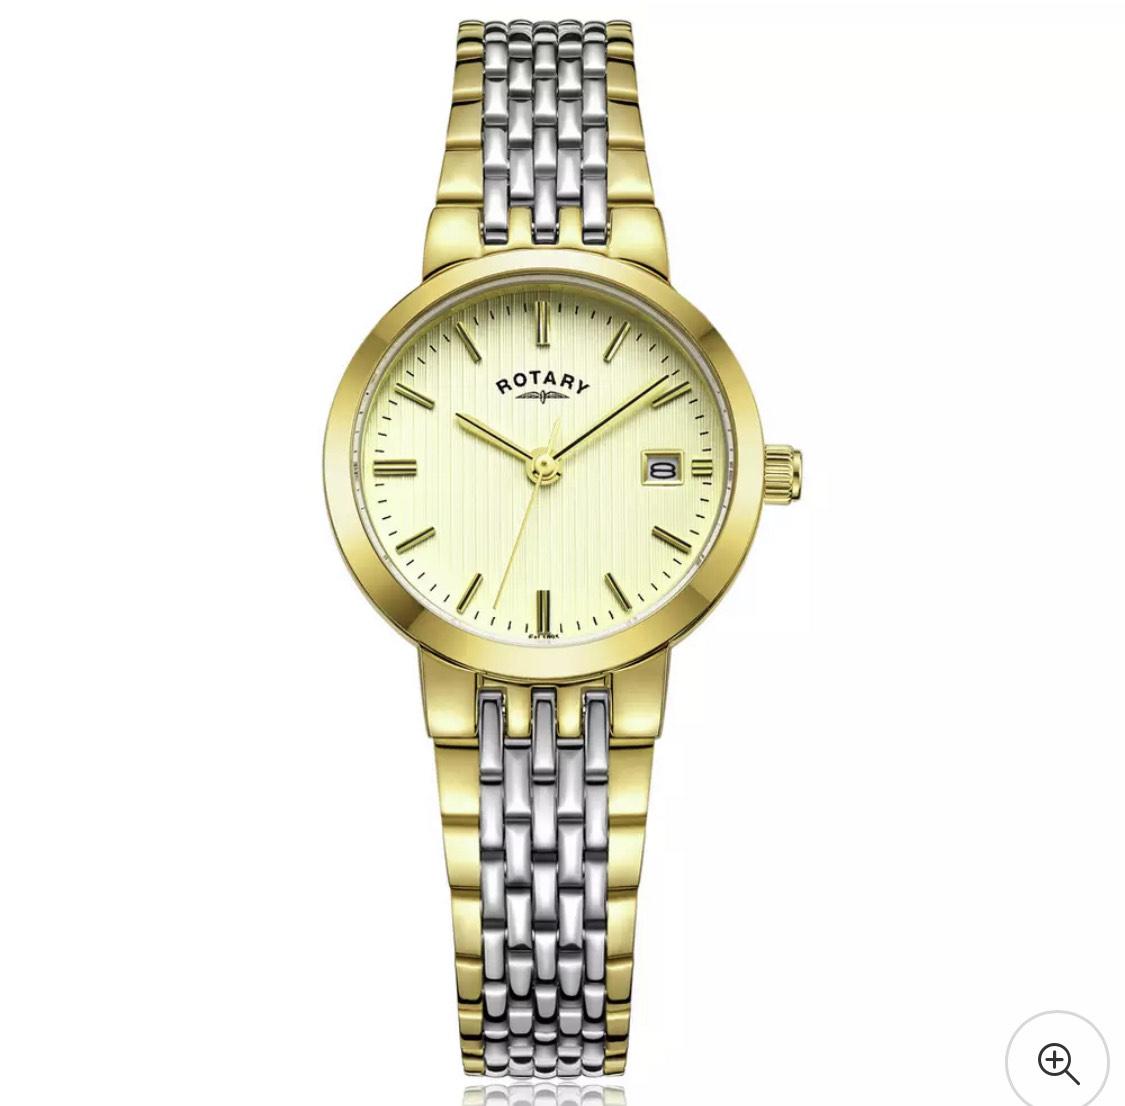 Rotary Ladies Two Tone Stainless Steel Bracelet Watch £37.99 @ Sam0989 eBay